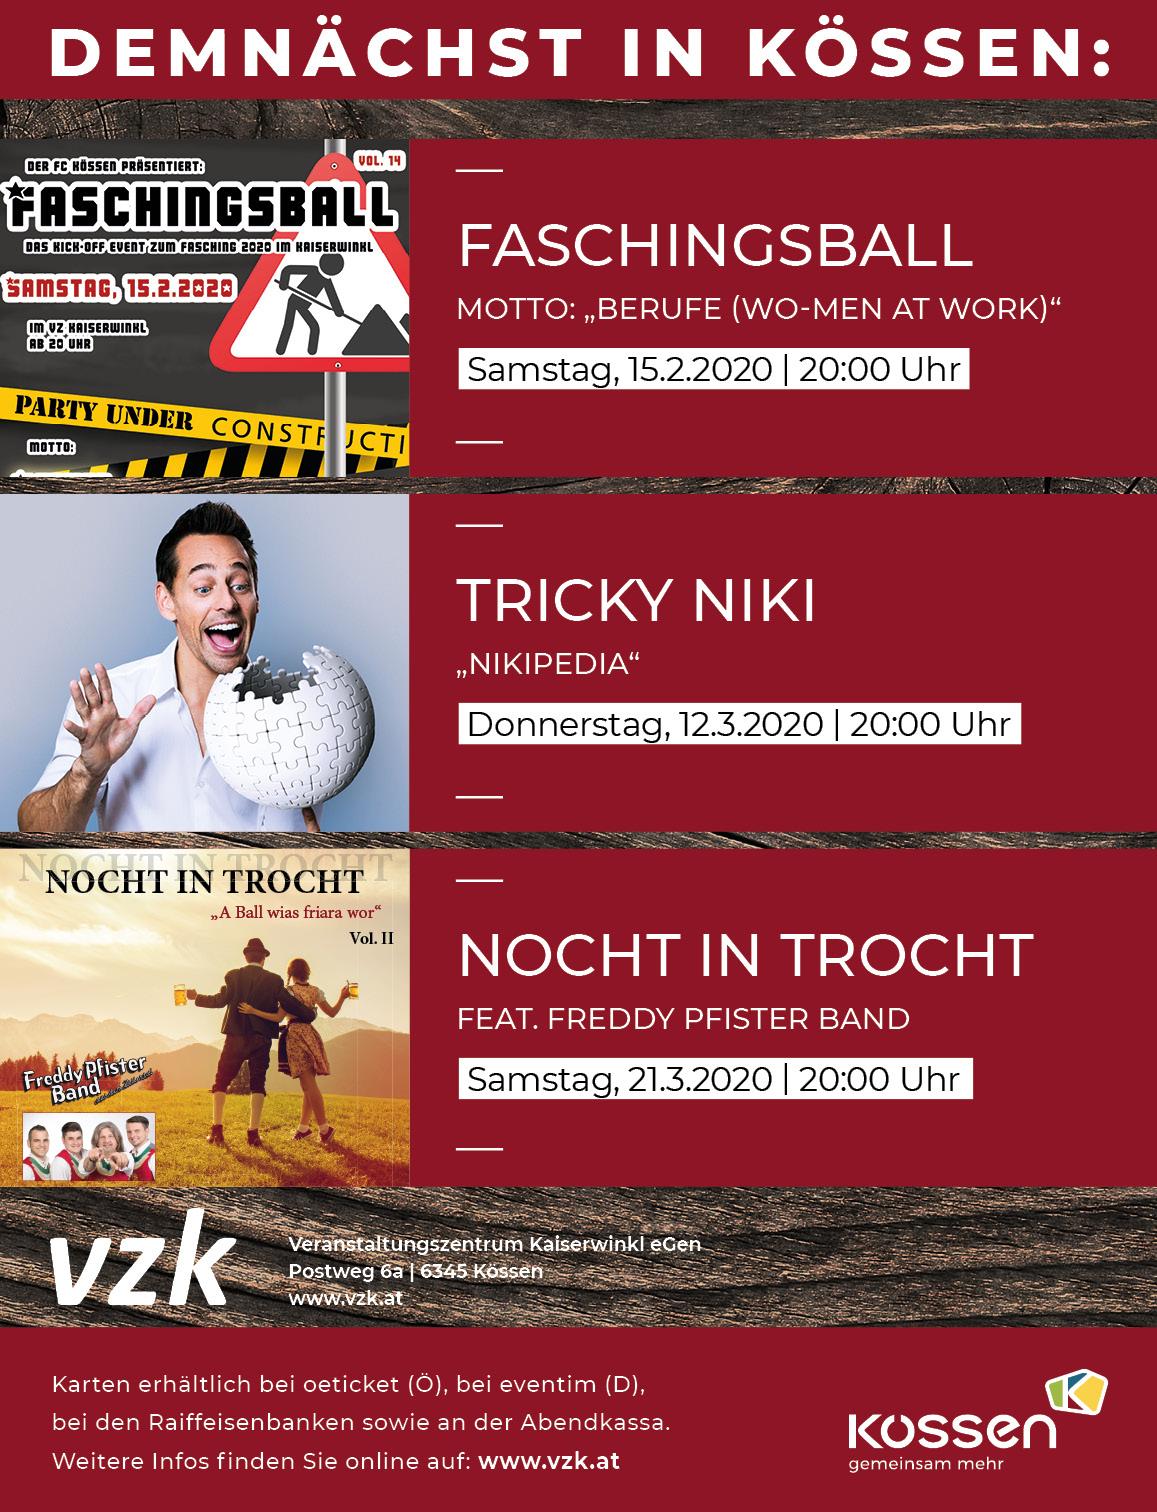 VZK 2020 01 Schimmel-Niki-Viera 98x128mm